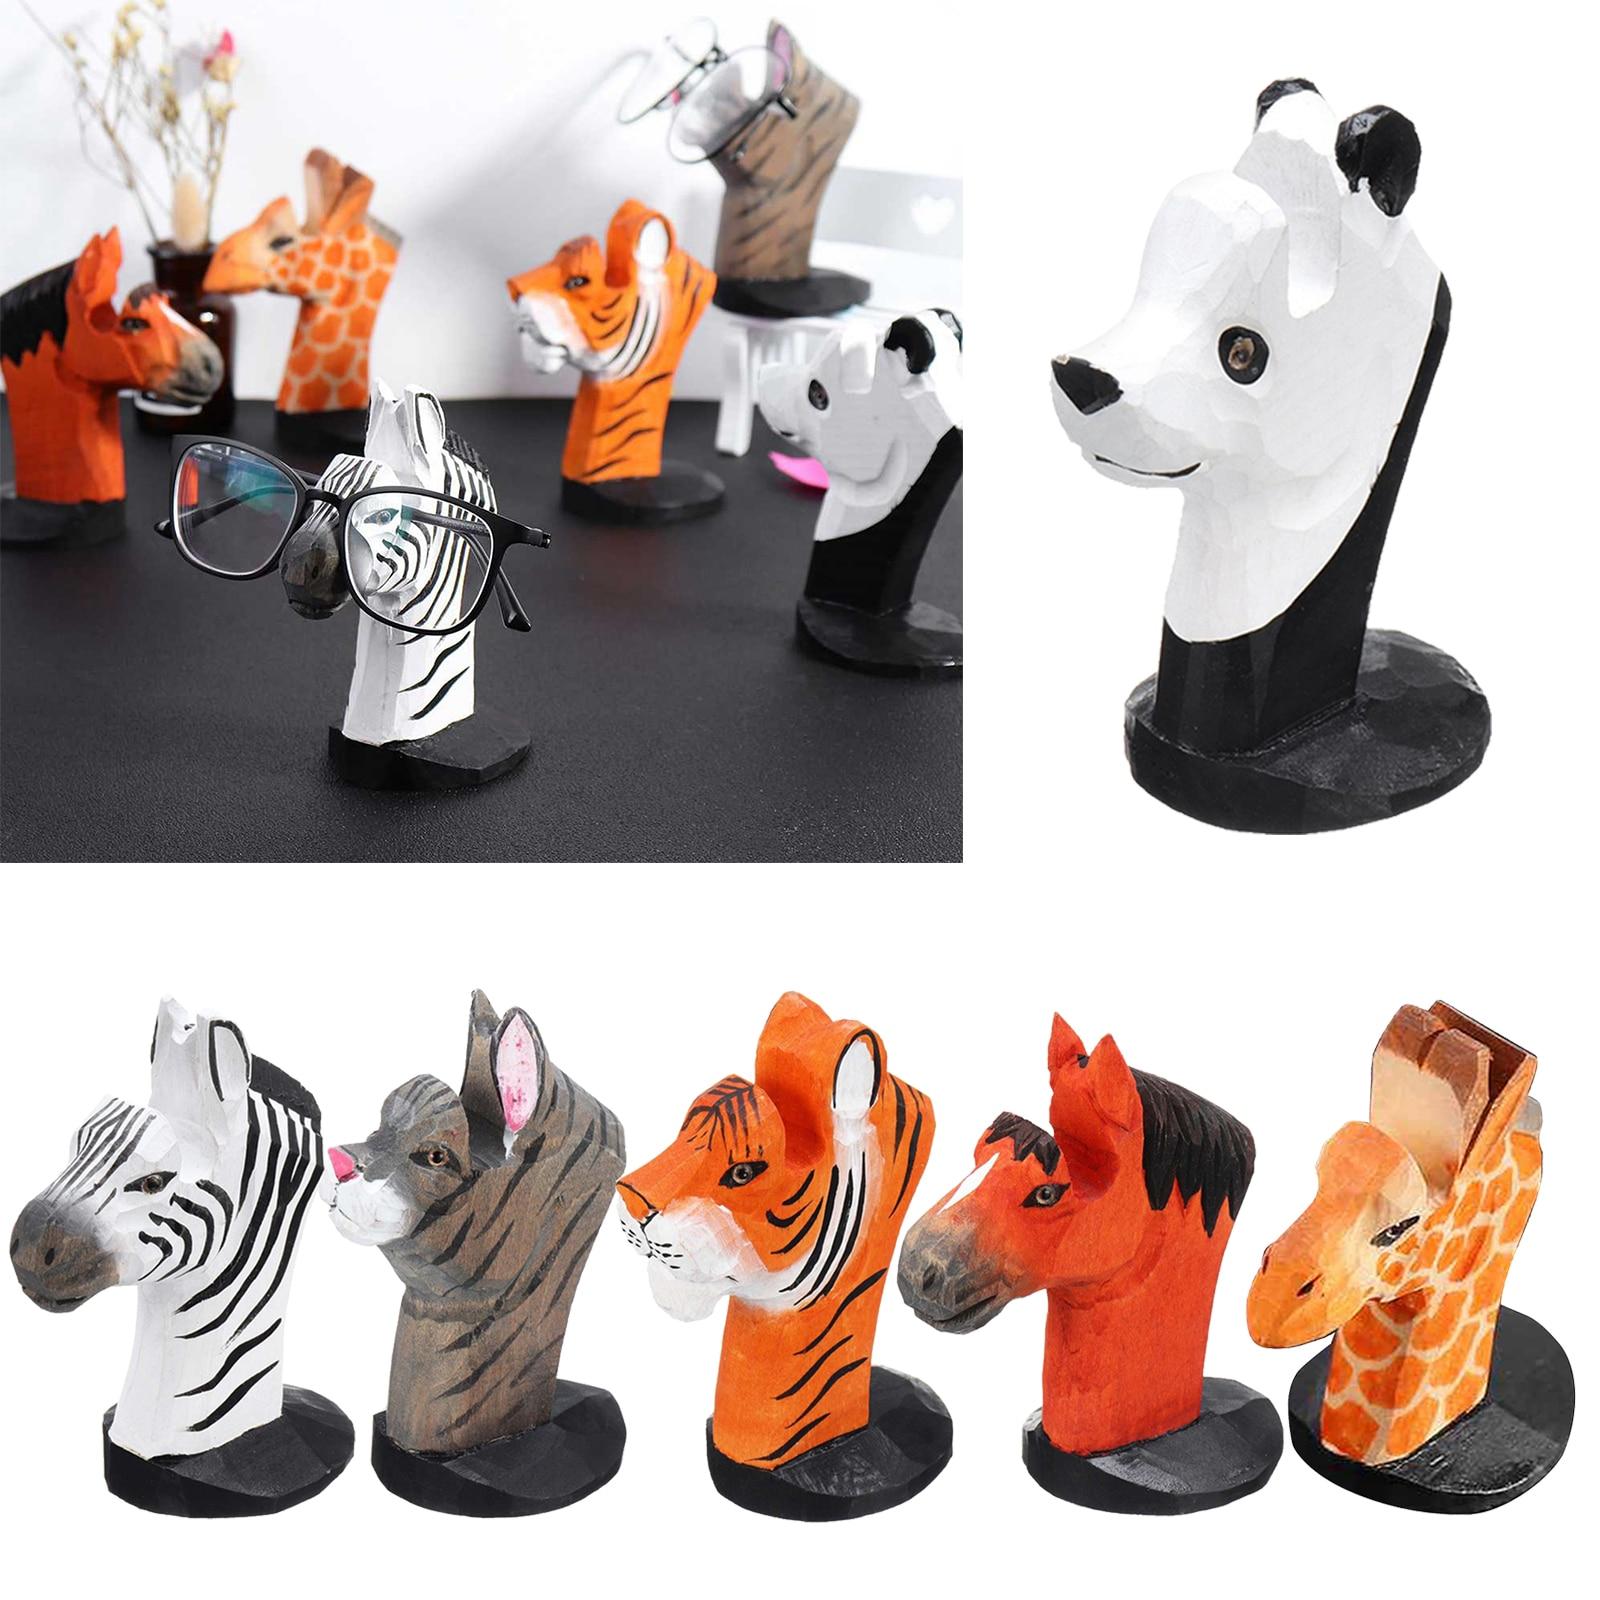 Cute 3D Animal Wood Carvings Sunglass Display Rack Shelf Eyeglasses Show Stand Jewelry Holder for Mu